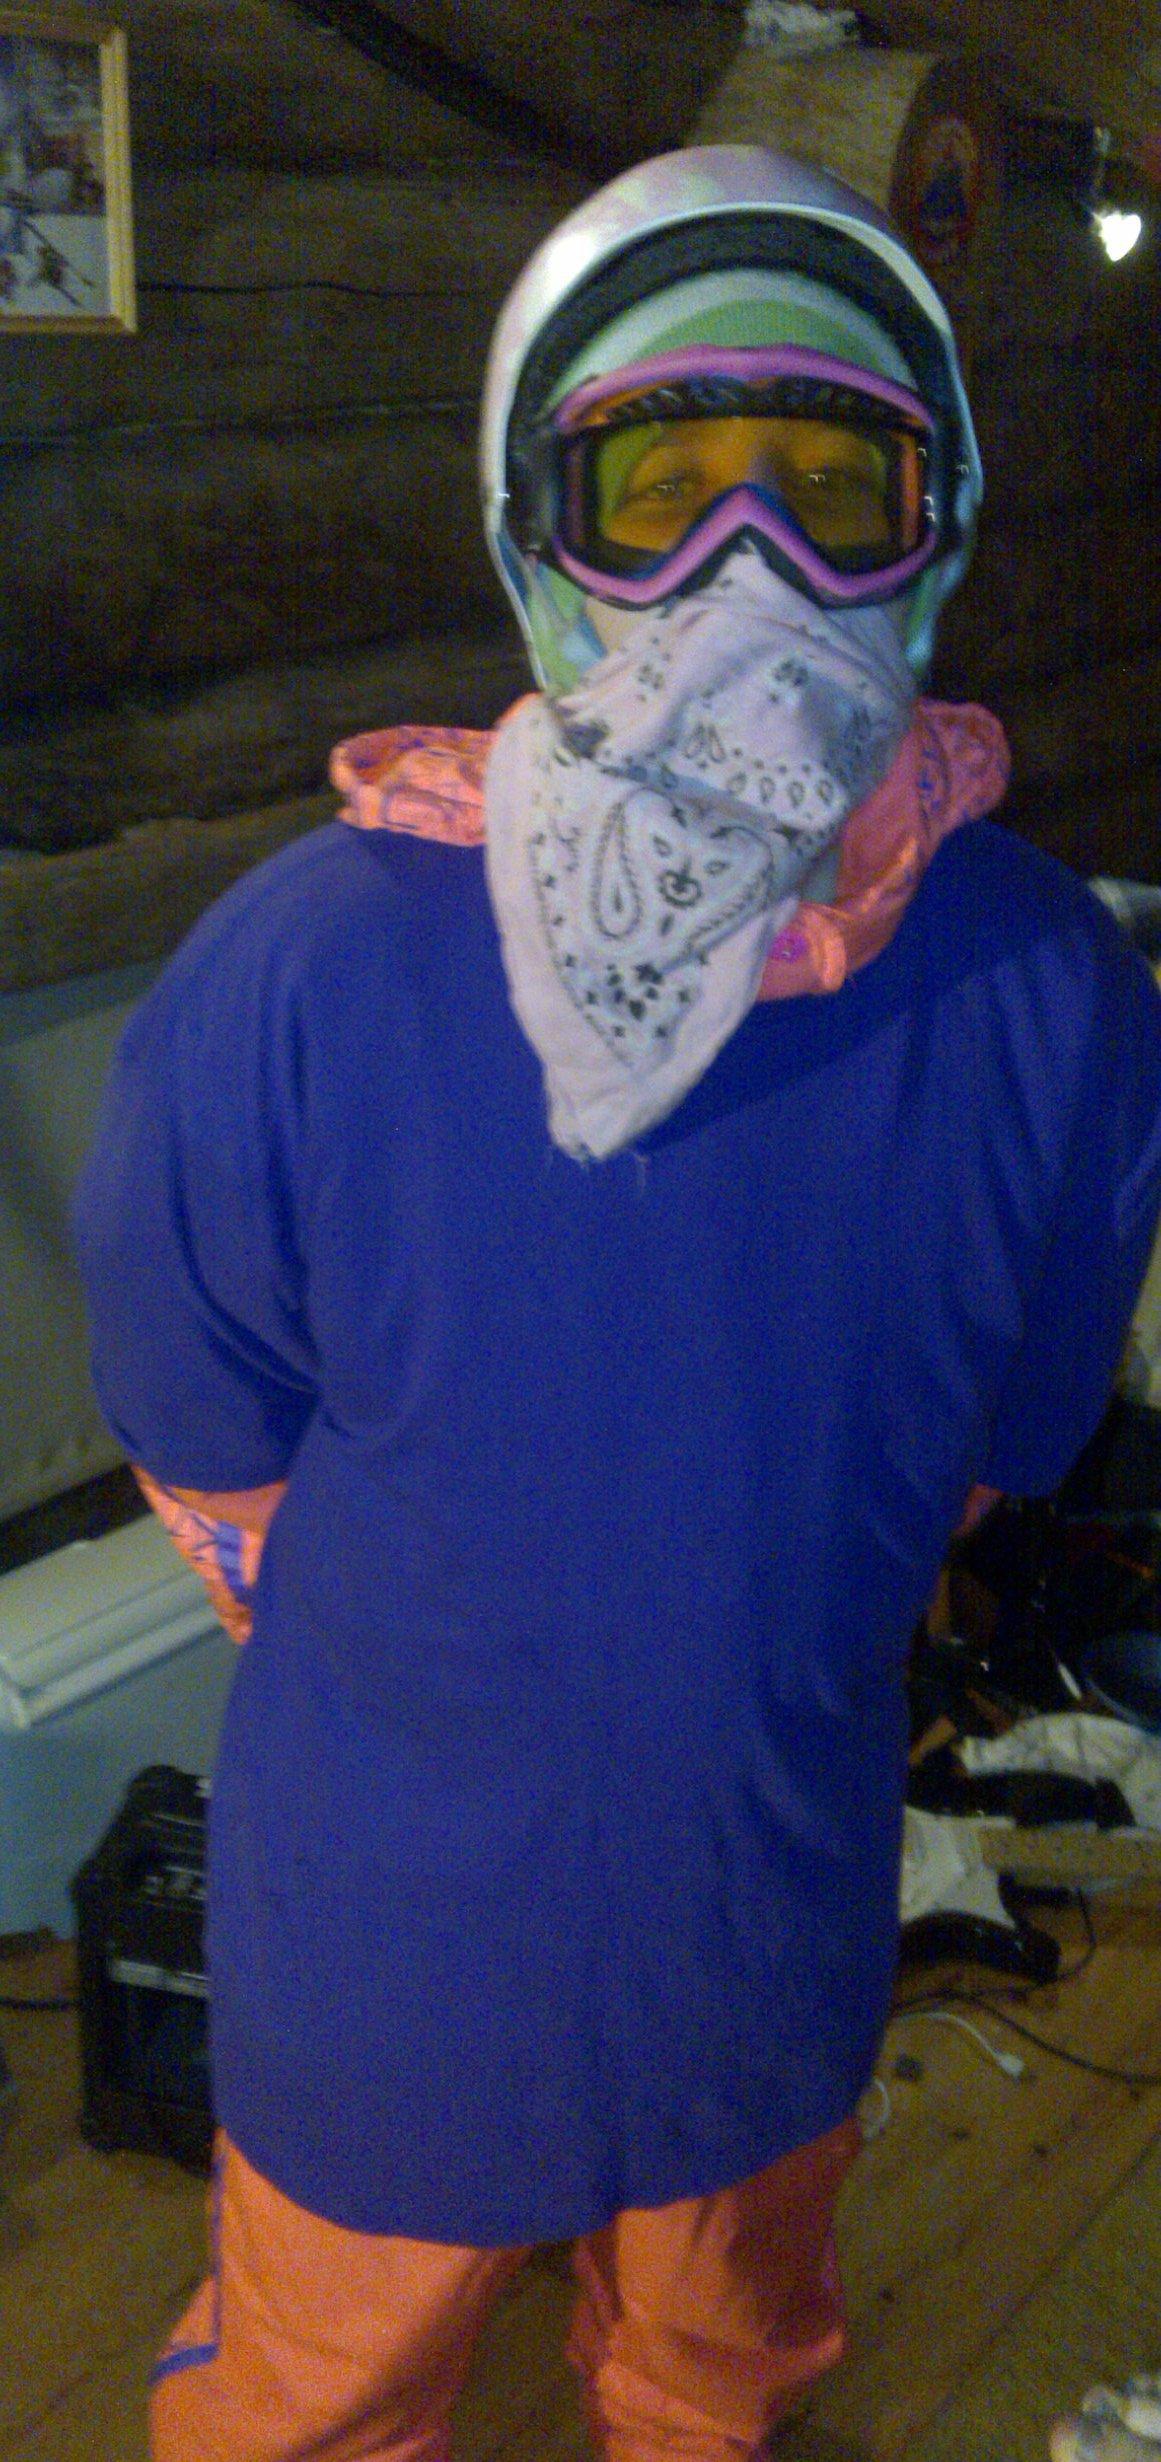 My new jumpsuit!